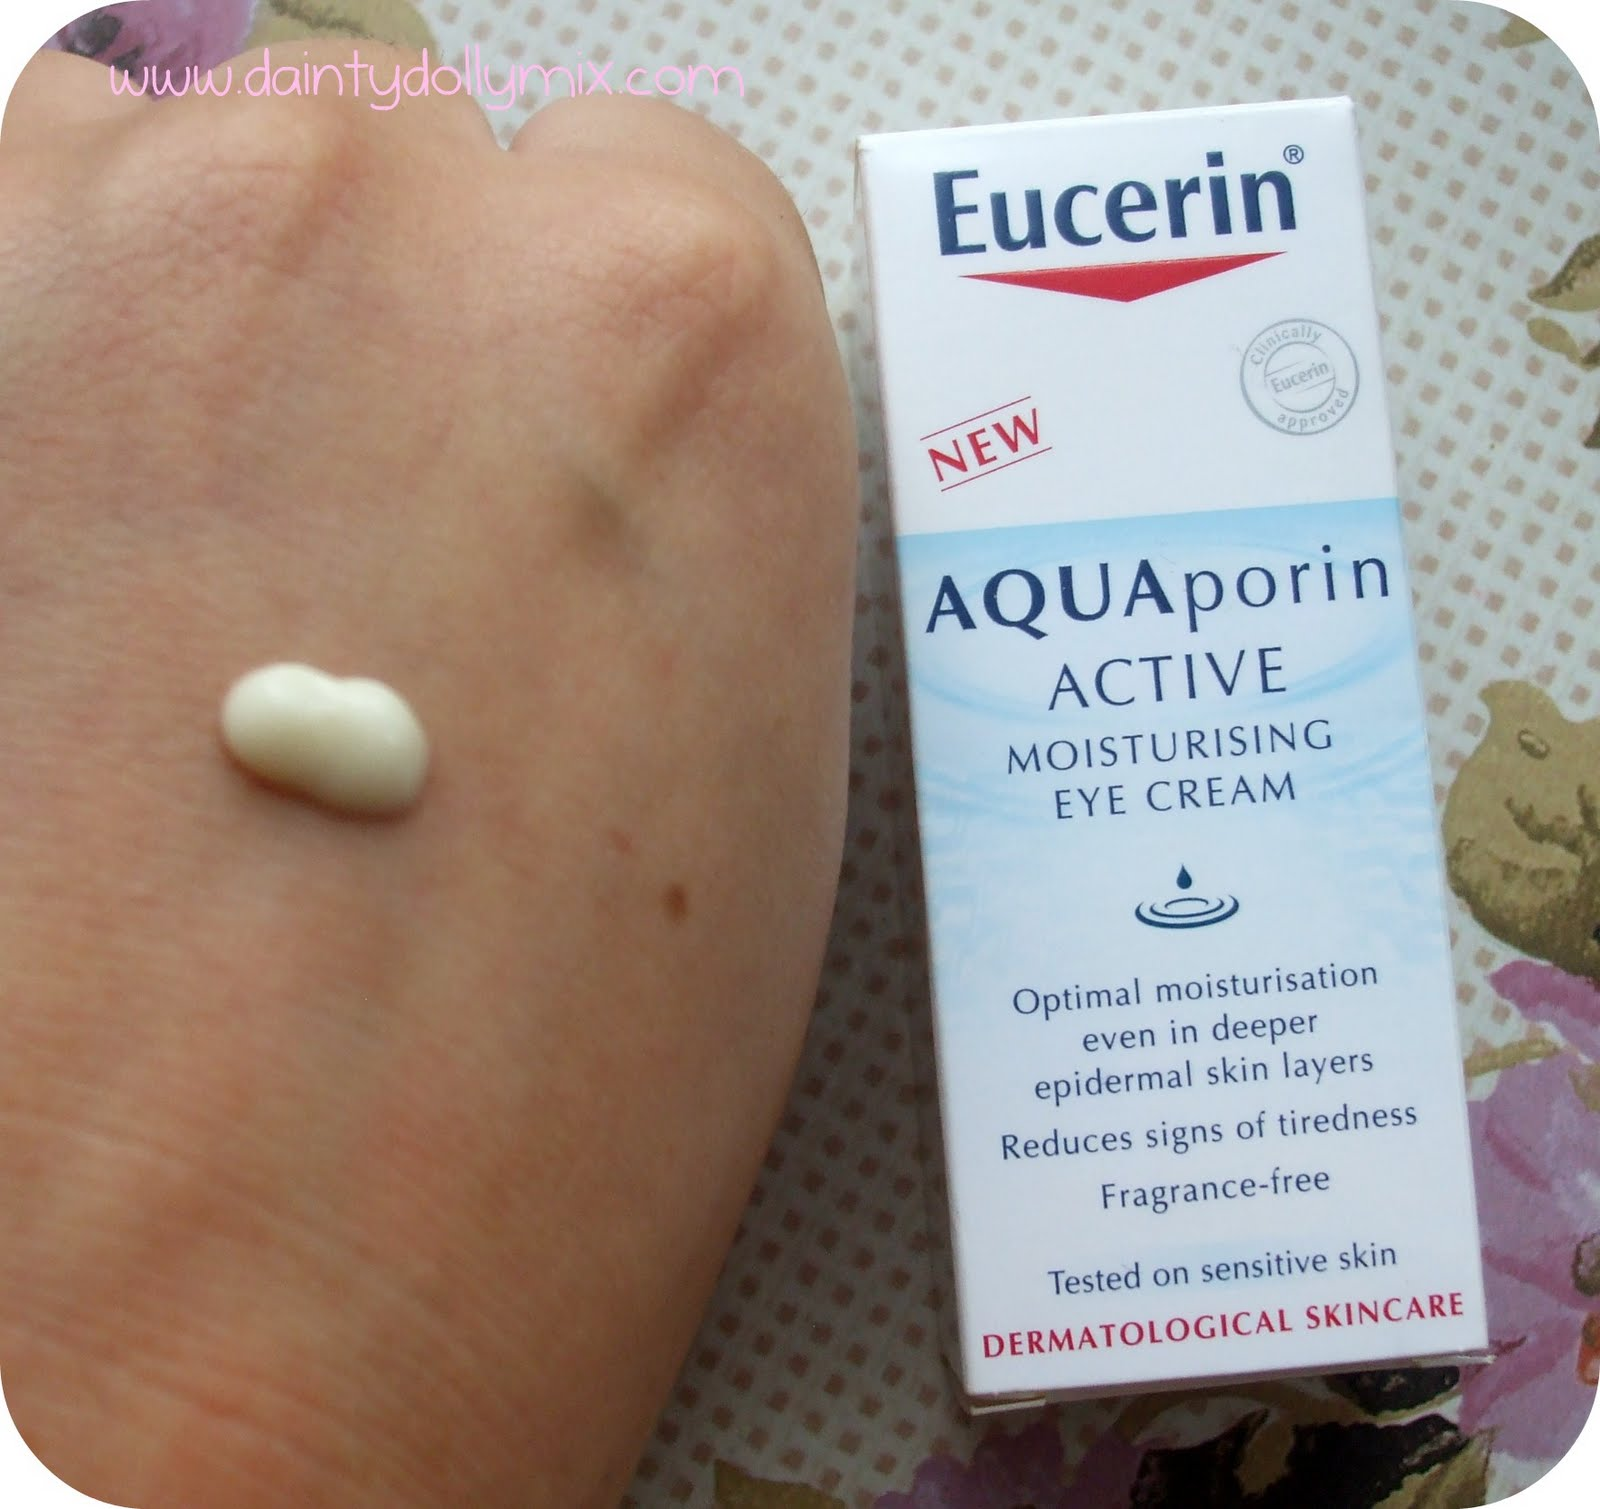 aquaporin eye cream